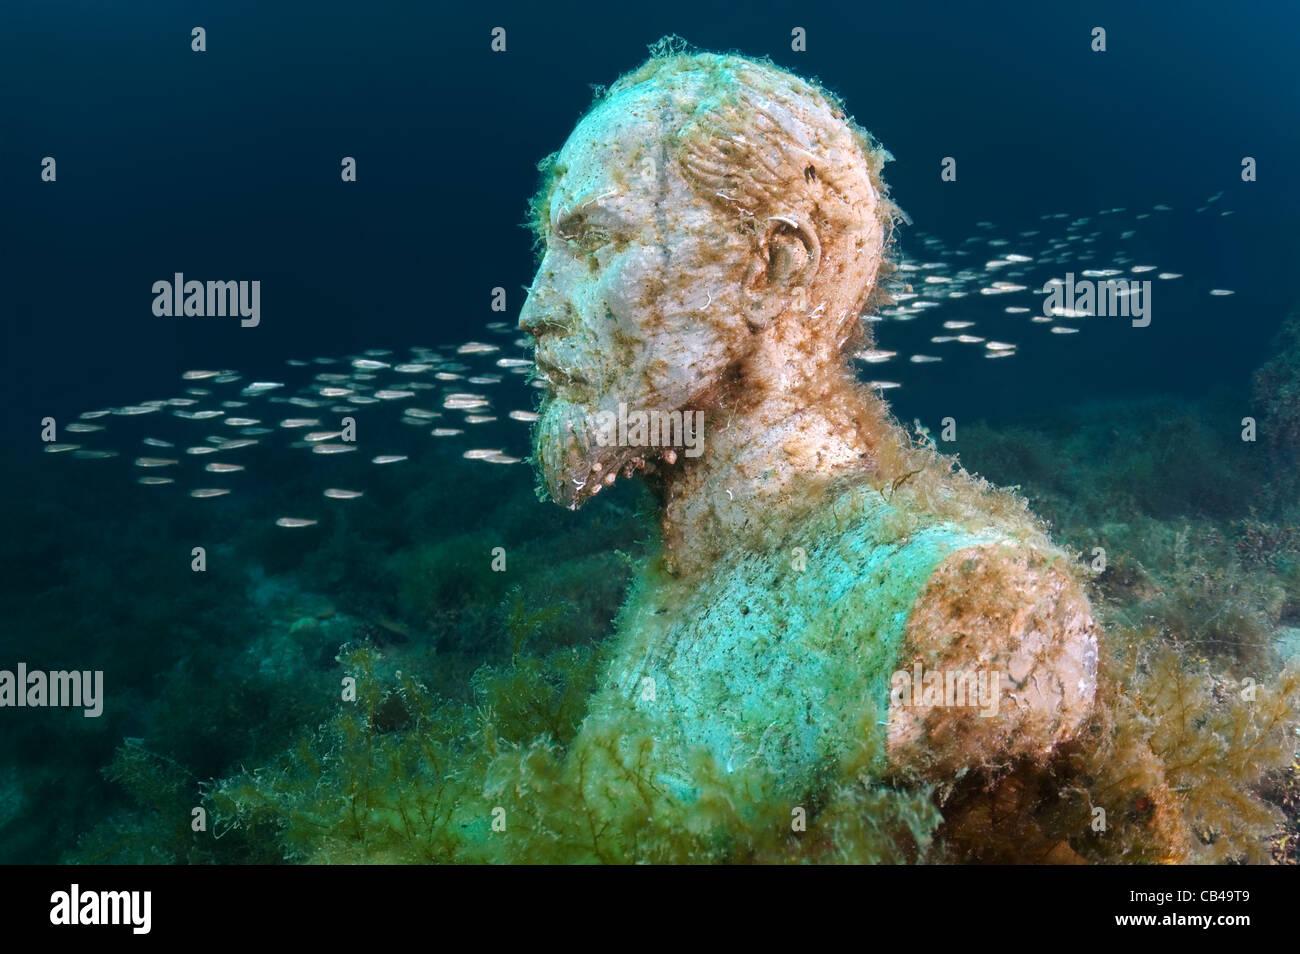 sculpture Felix Edmundovich Dzerzhinsky to first in the world underwater museum Leaders' Alley or Soviet Atlantis - Stock Image